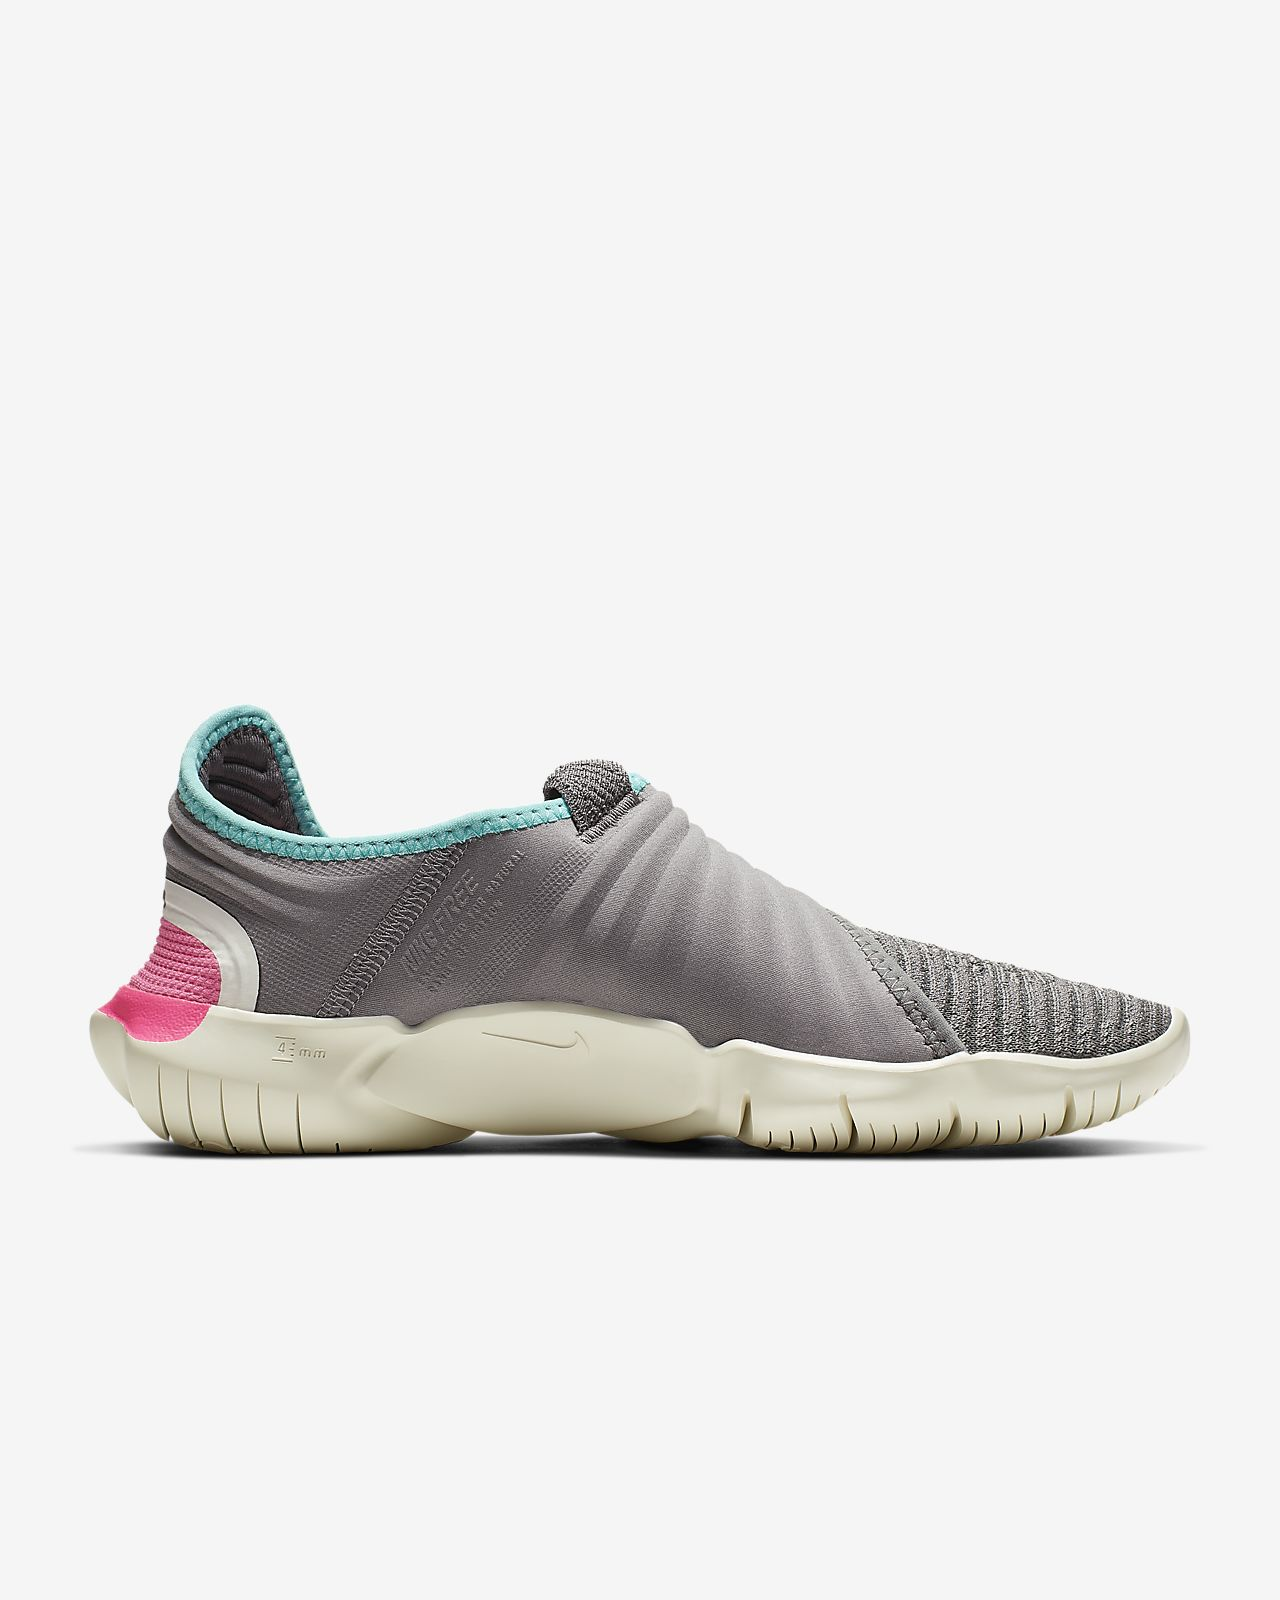 the best attitude 147ea c5c4b ... Chaussure de running Nike Free RN Flyknit 3.0 pour Femme